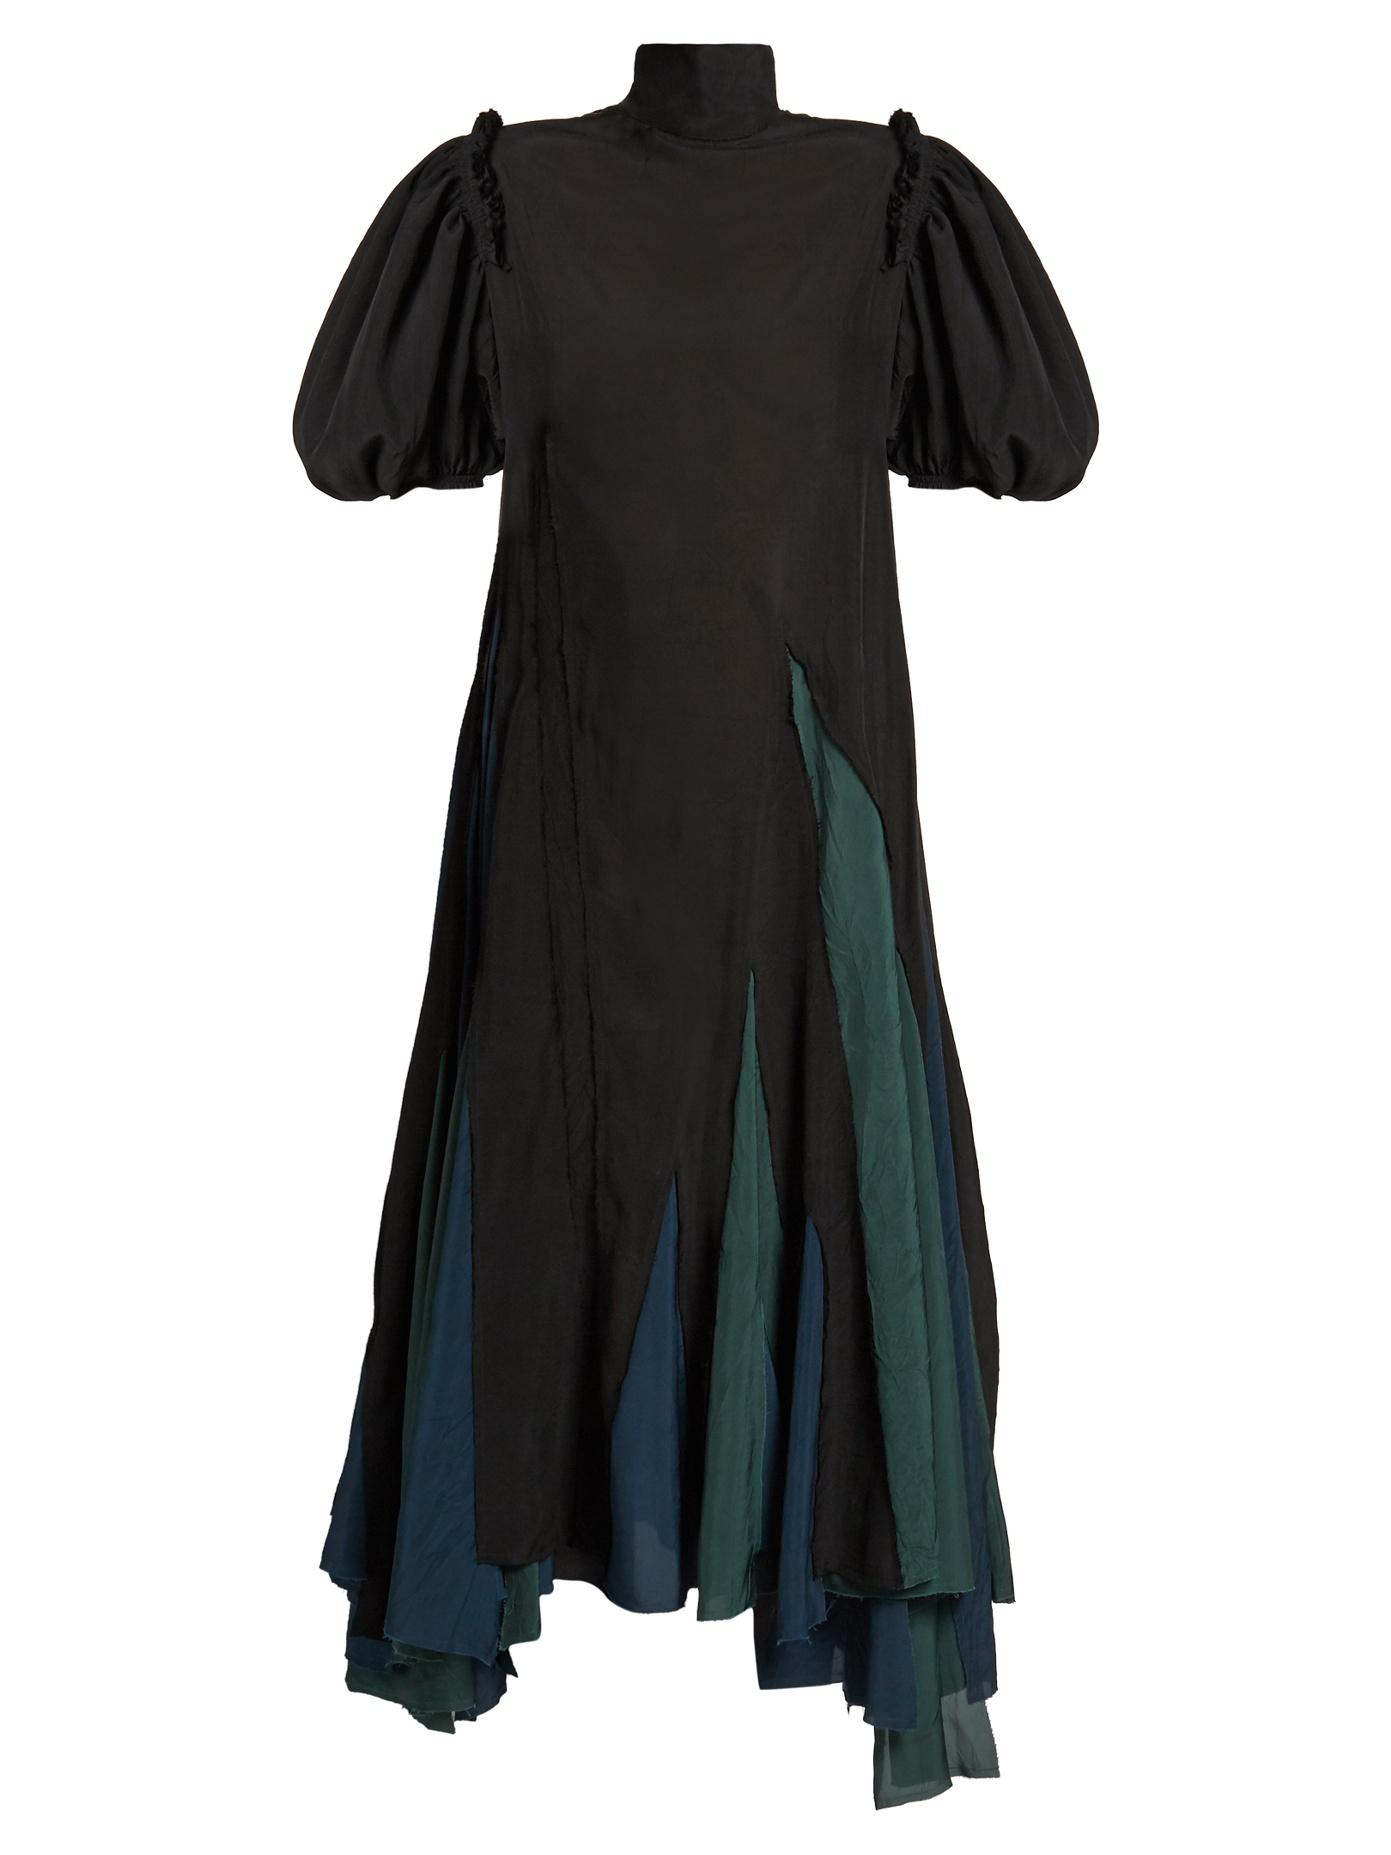 Loewe Balloon-Sleeved Asymmetric-Hem Dress In Black Green